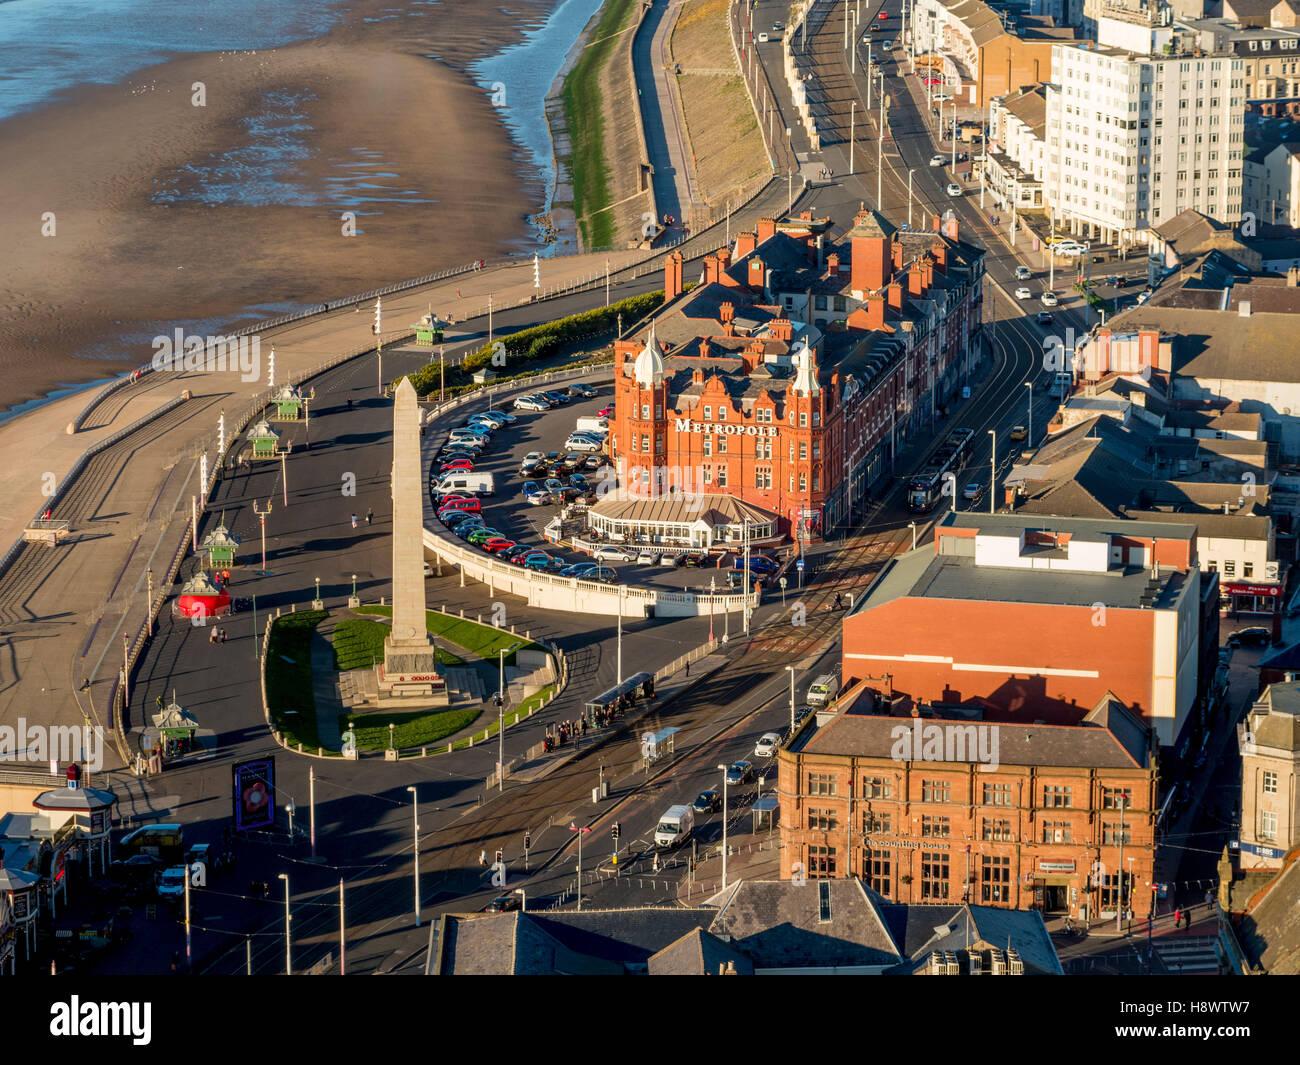 Krieg-Denkmal und Metropole Hotel, Norden direkt am Meer, Blackpool, Lancashire, UK. Stockbild